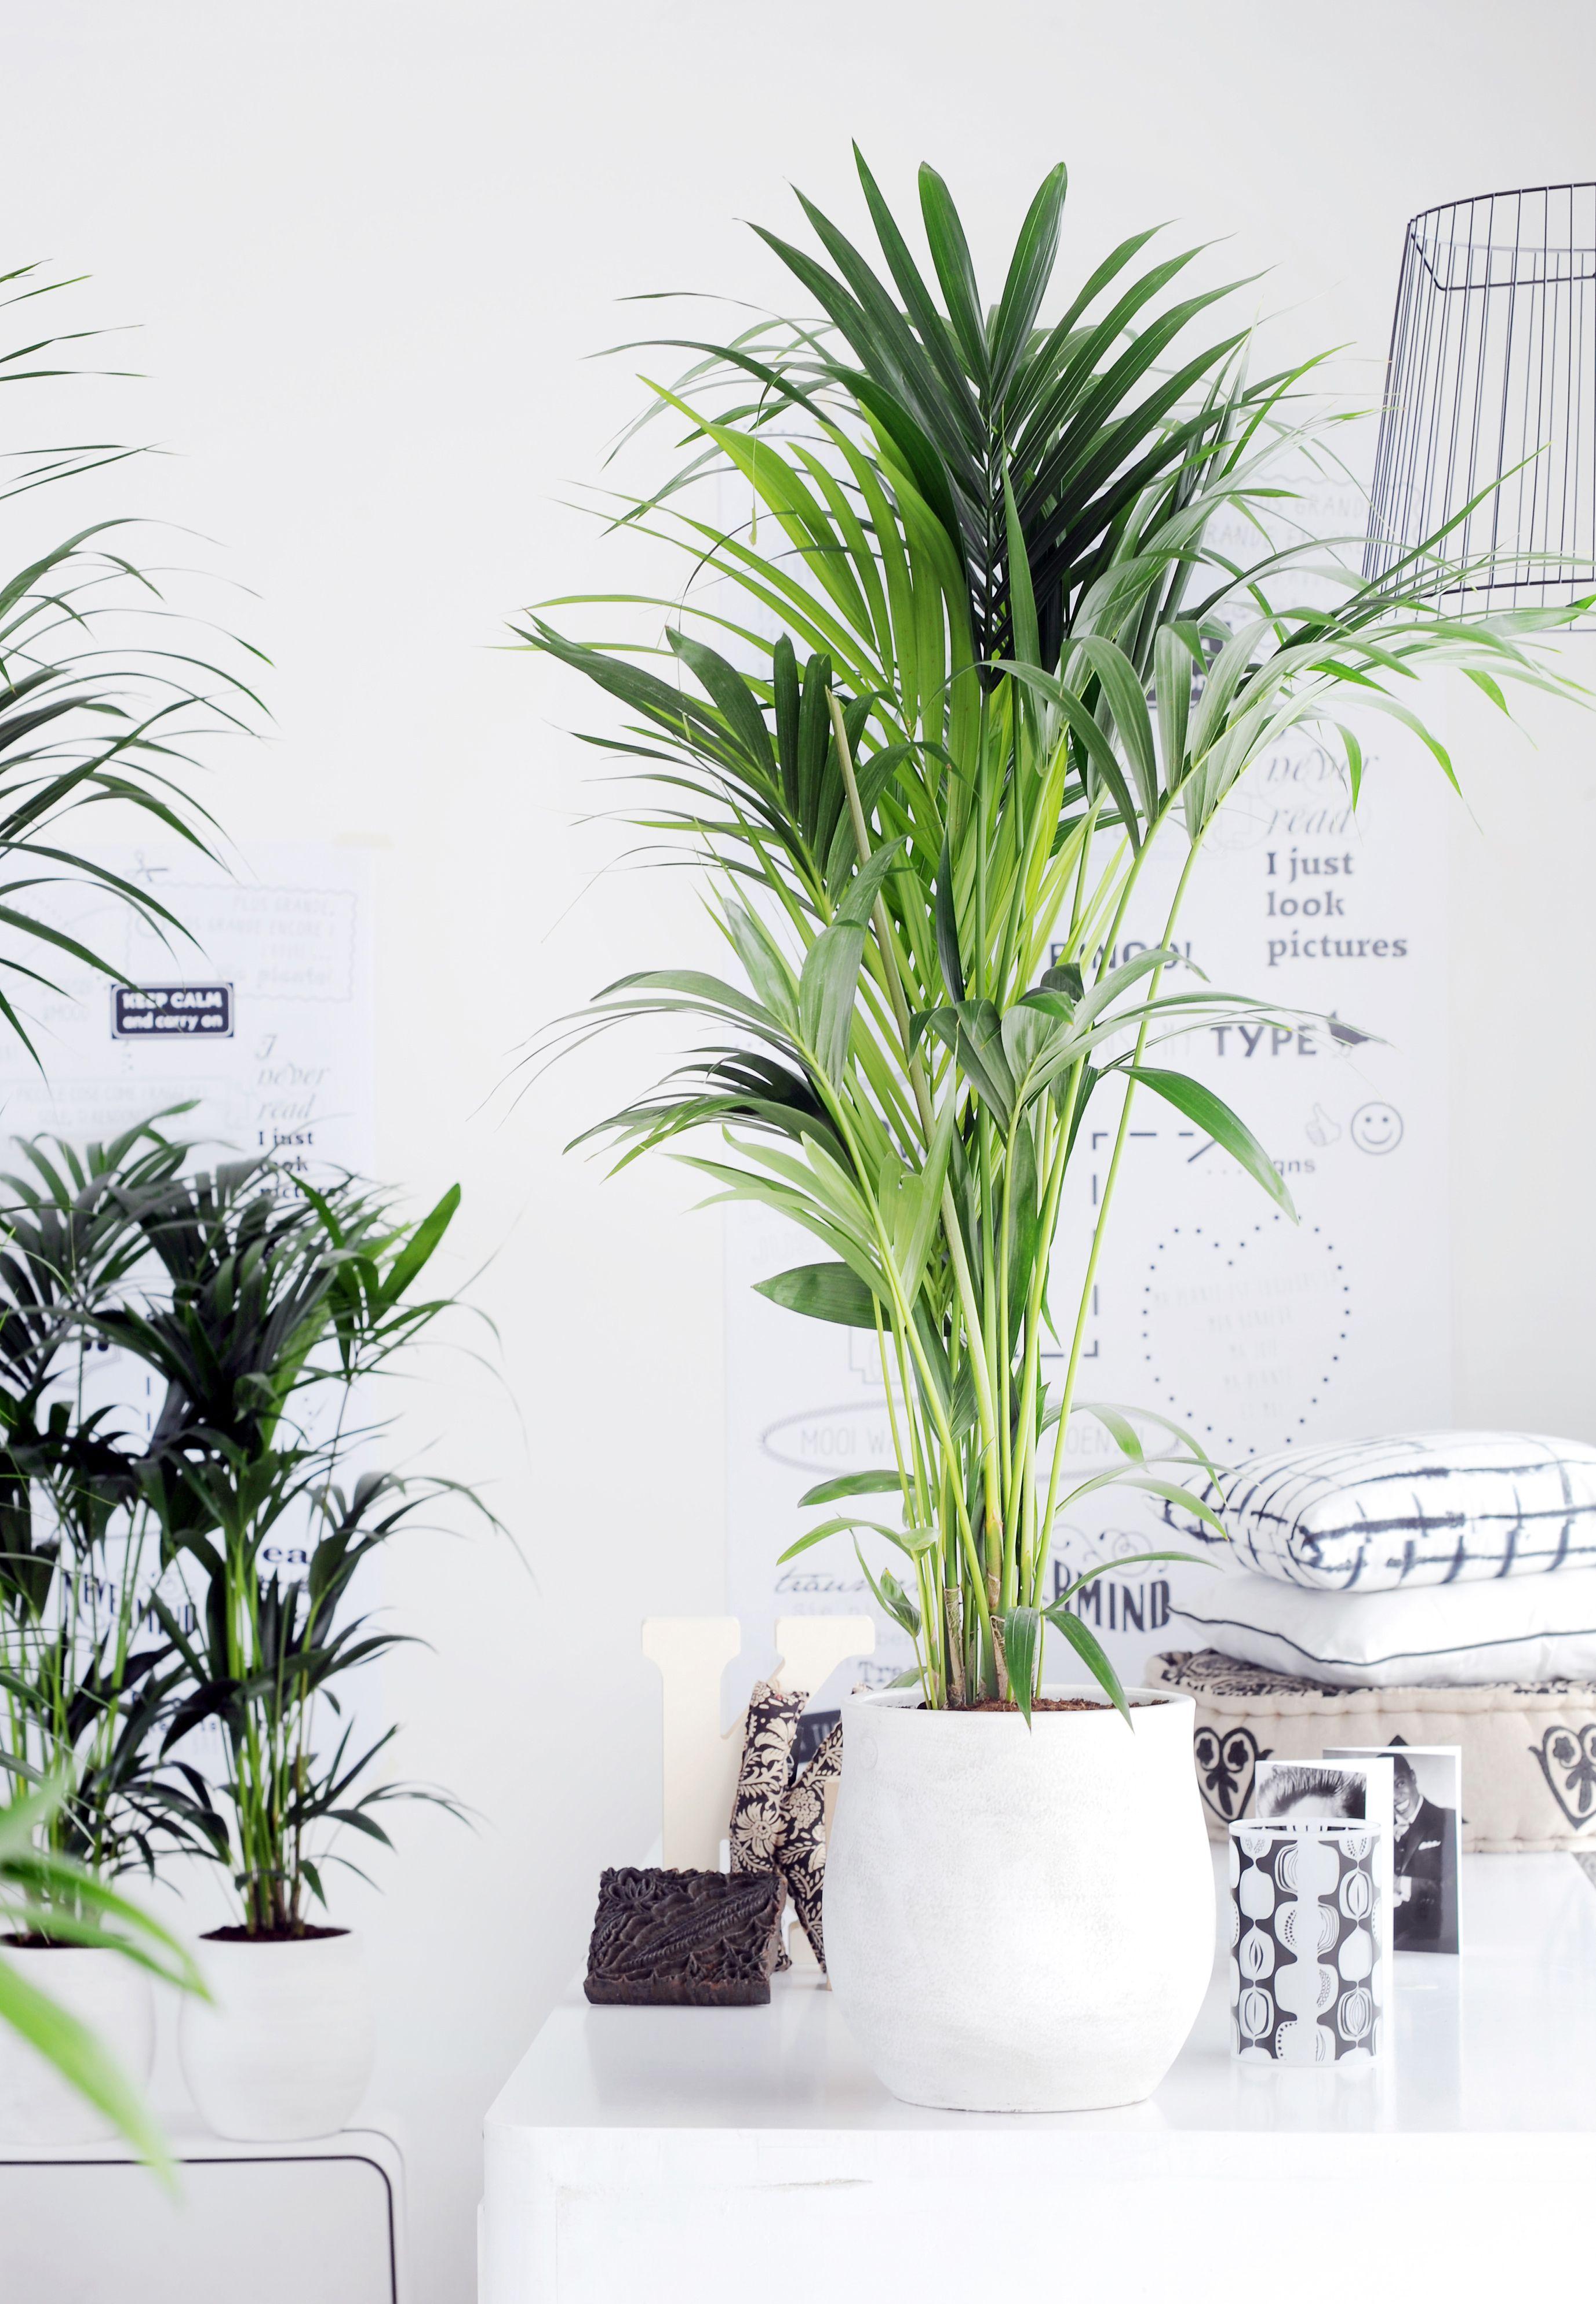 die zimmerpflanze des monats januar kentia howea pflanzenfreude pflanzen bbh palmen. Black Bedroom Furniture Sets. Home Design Ideas